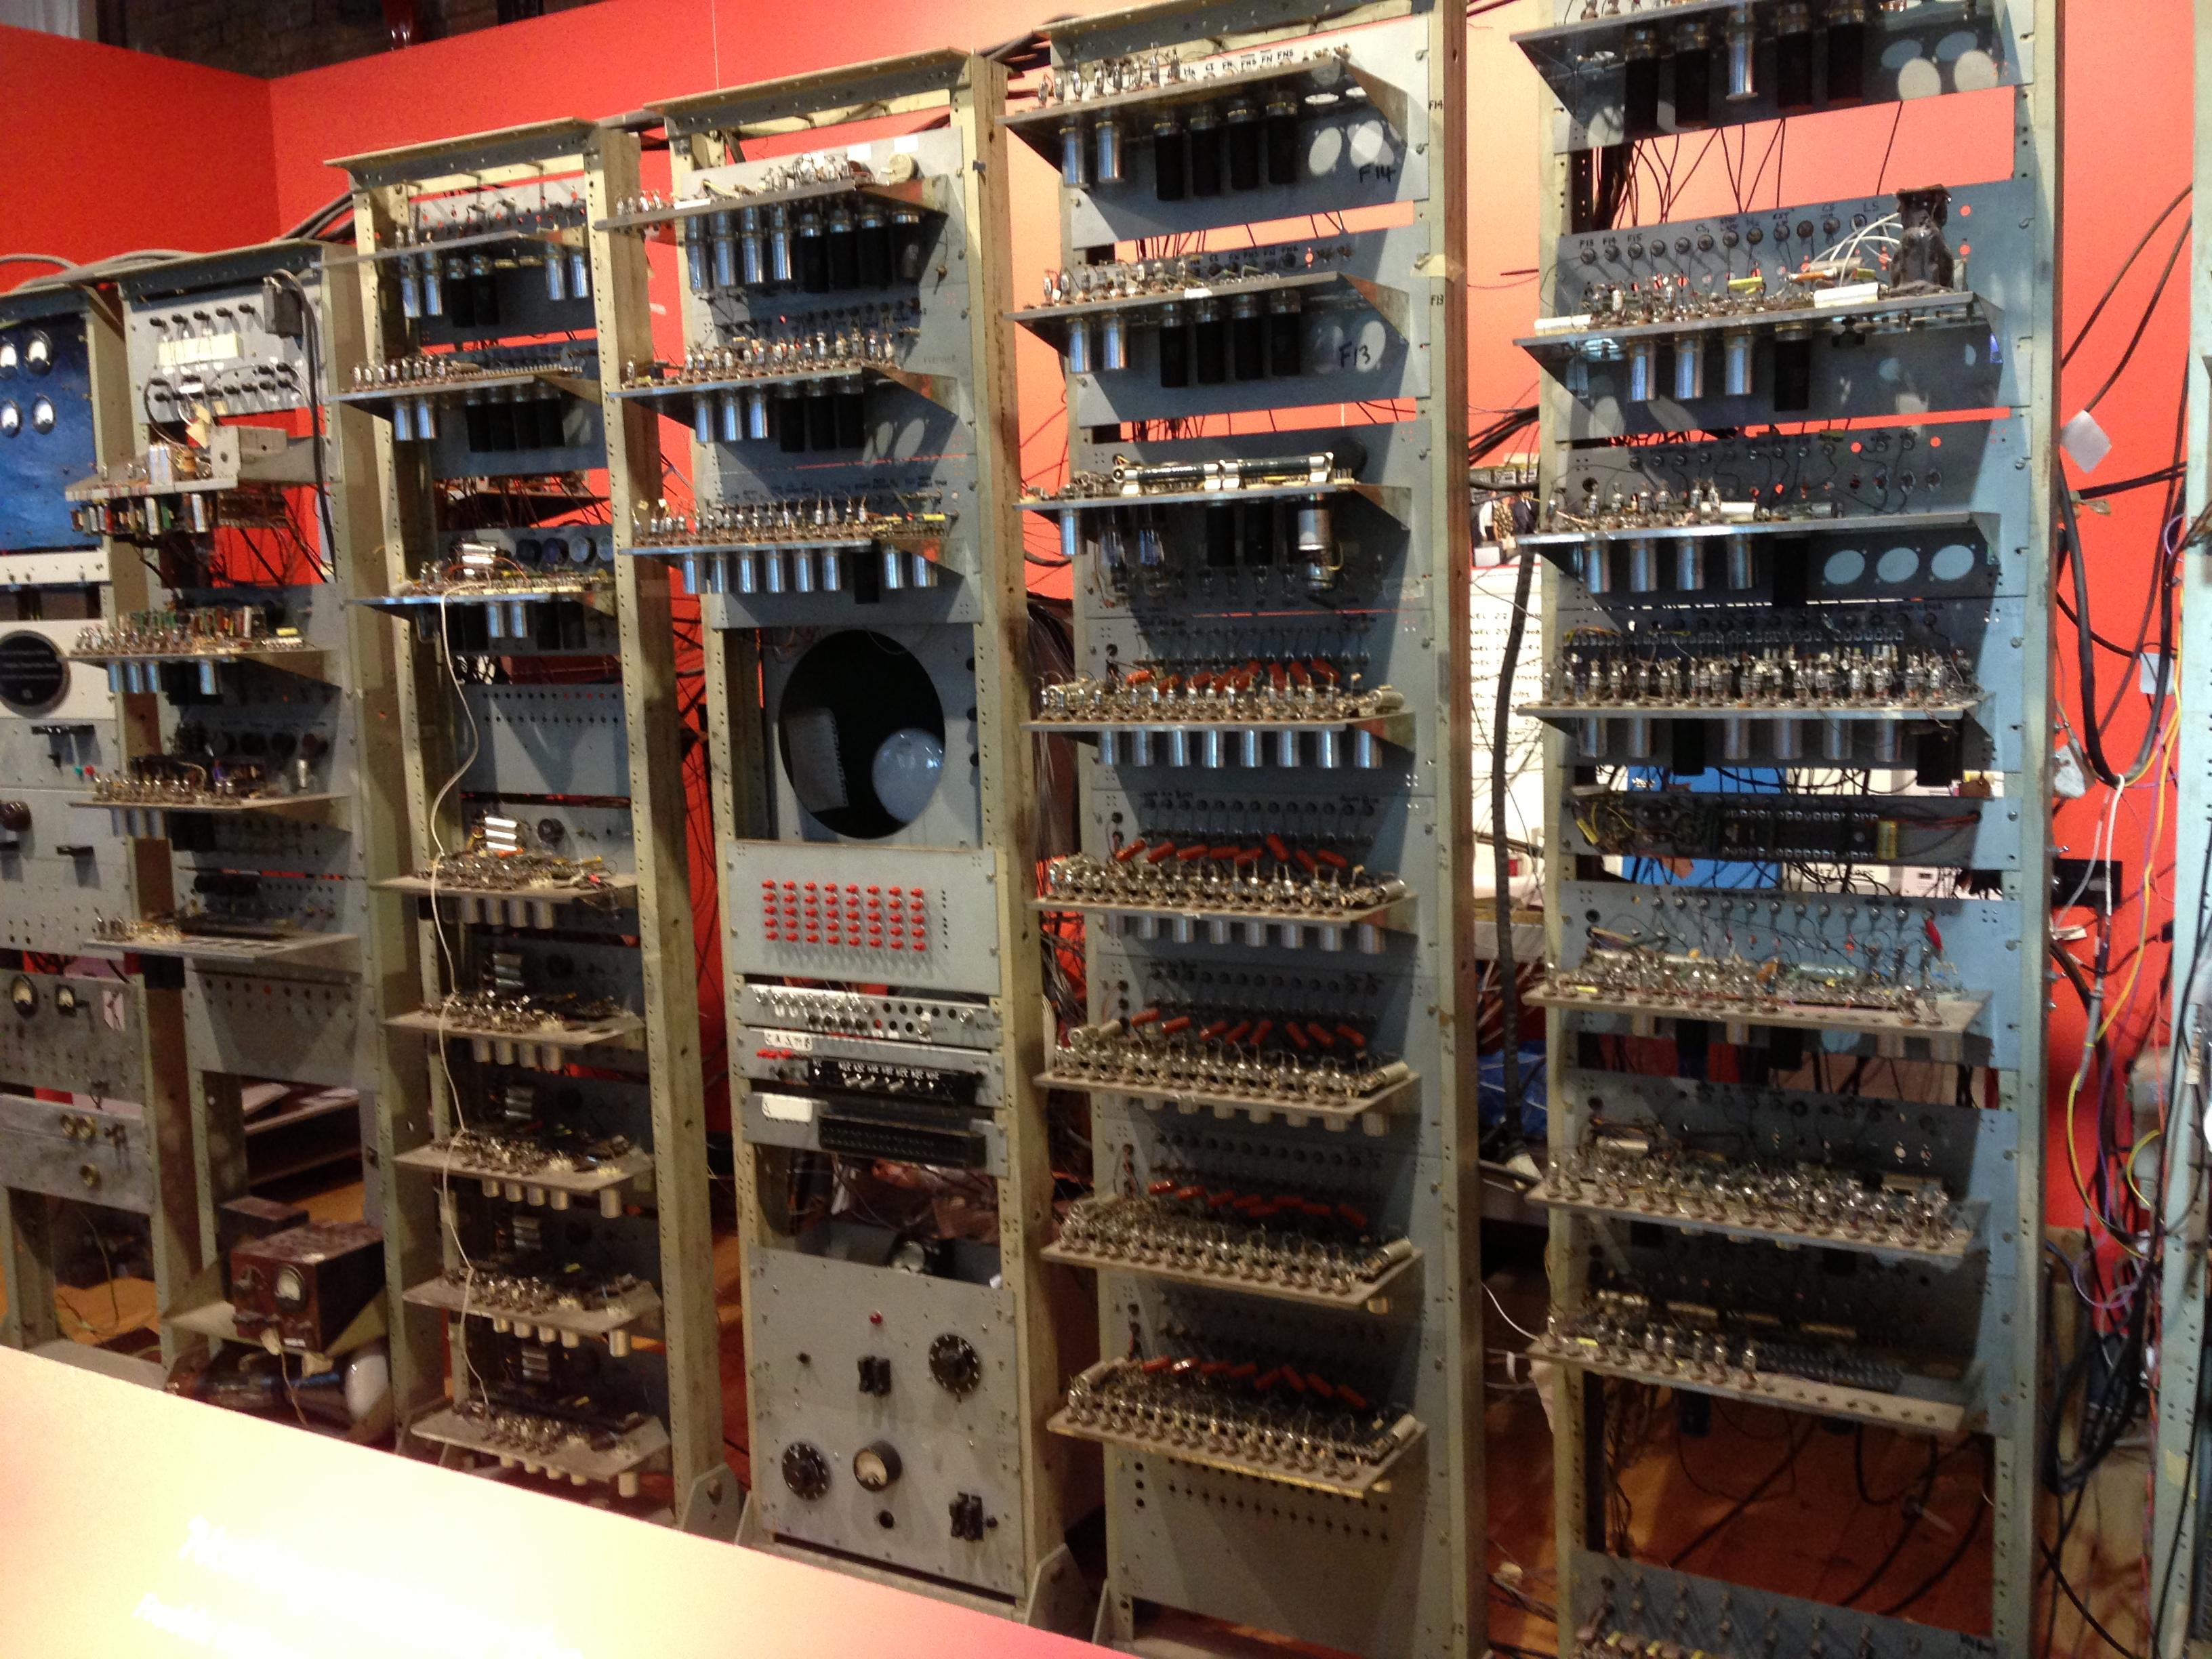 MOSI early computer